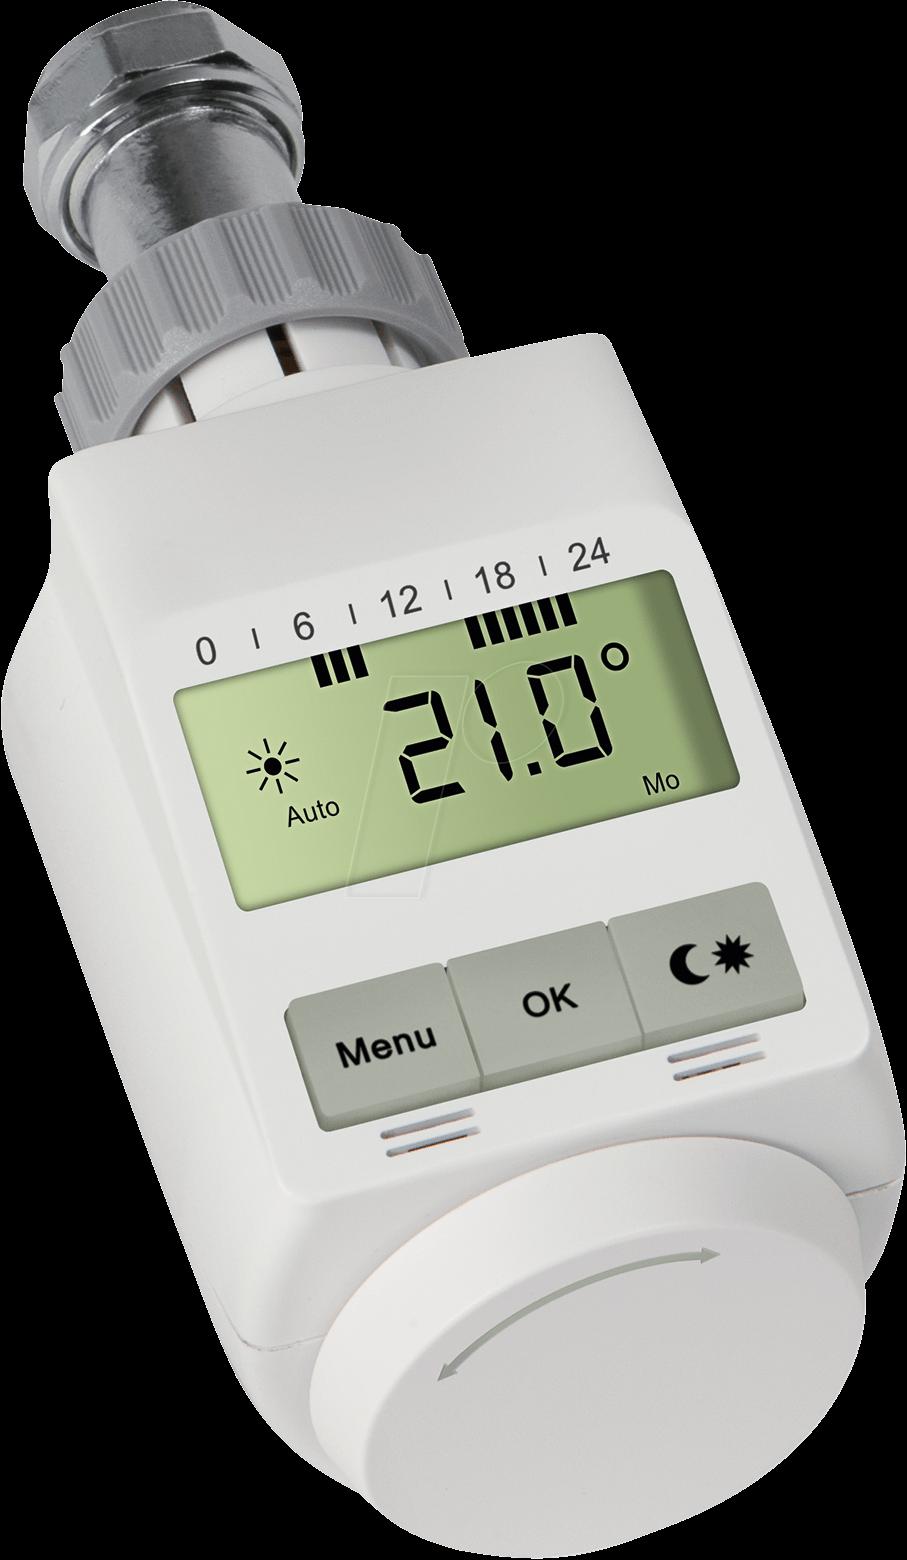 eht classic pro elektronisches heizk rper thermostat classic pro bei reichelt elektronik